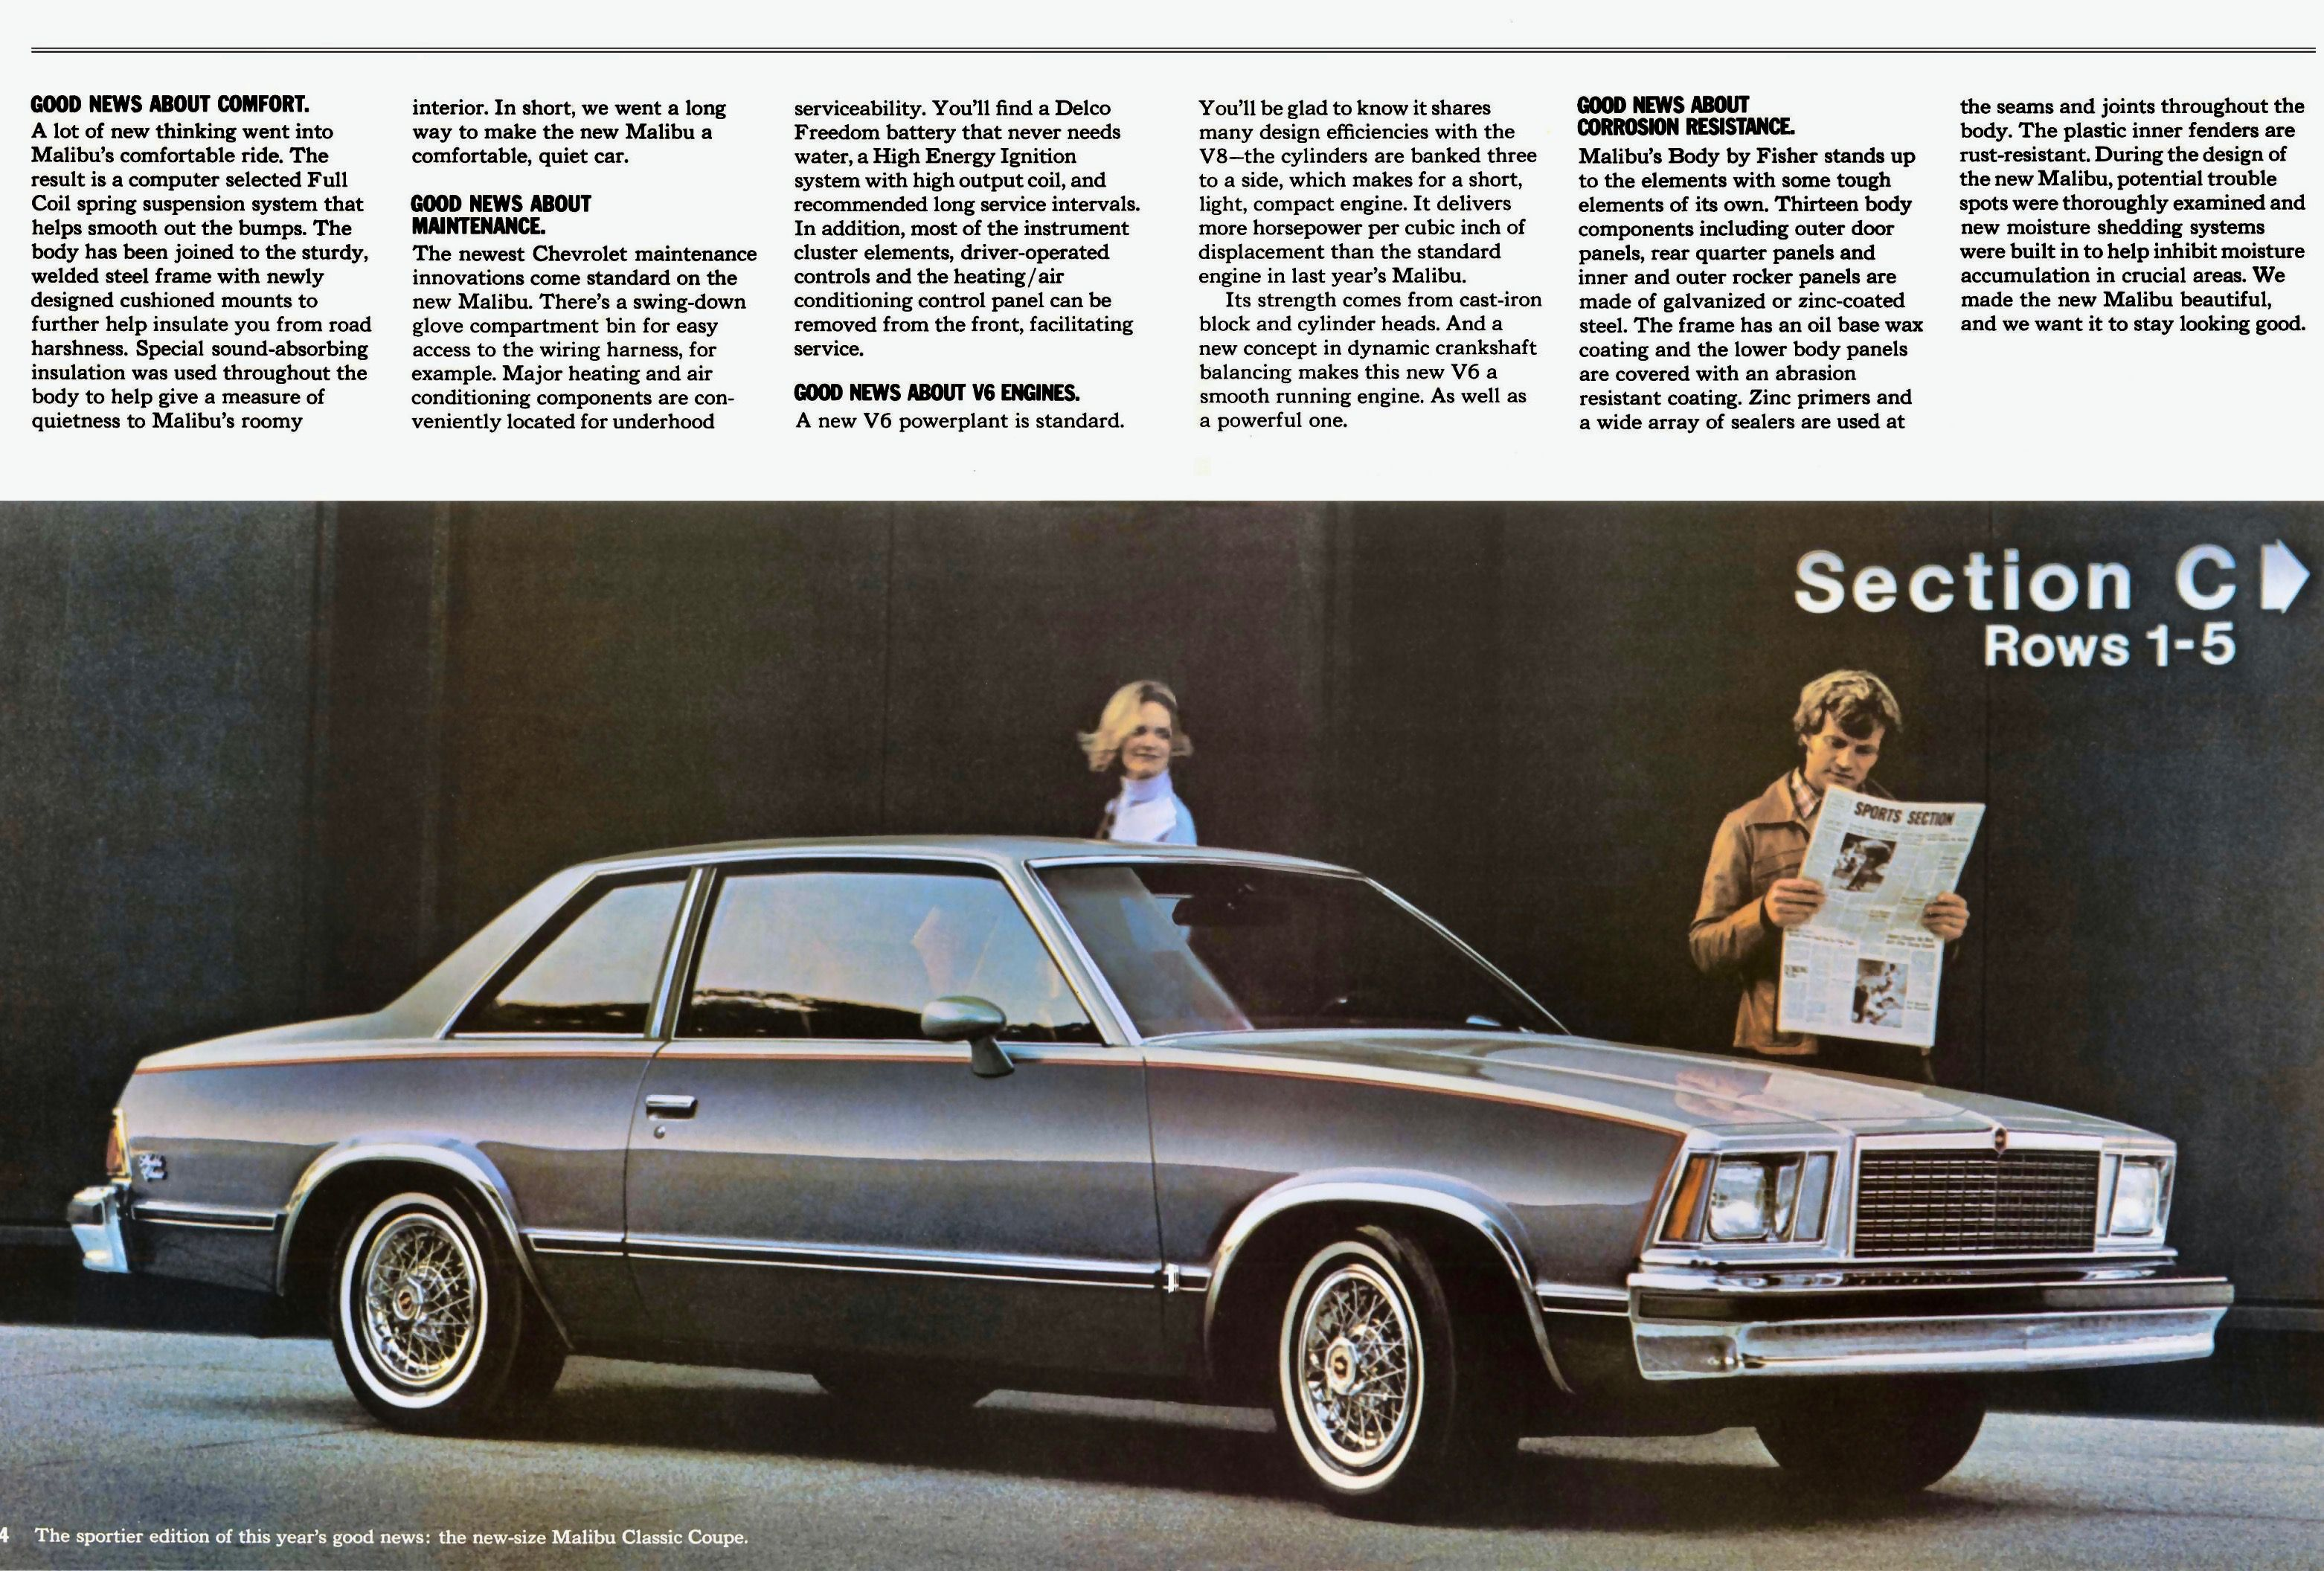 1978 Chevy Malibu Coupe Chevy Malibu Chevrolet Malibu Caprice